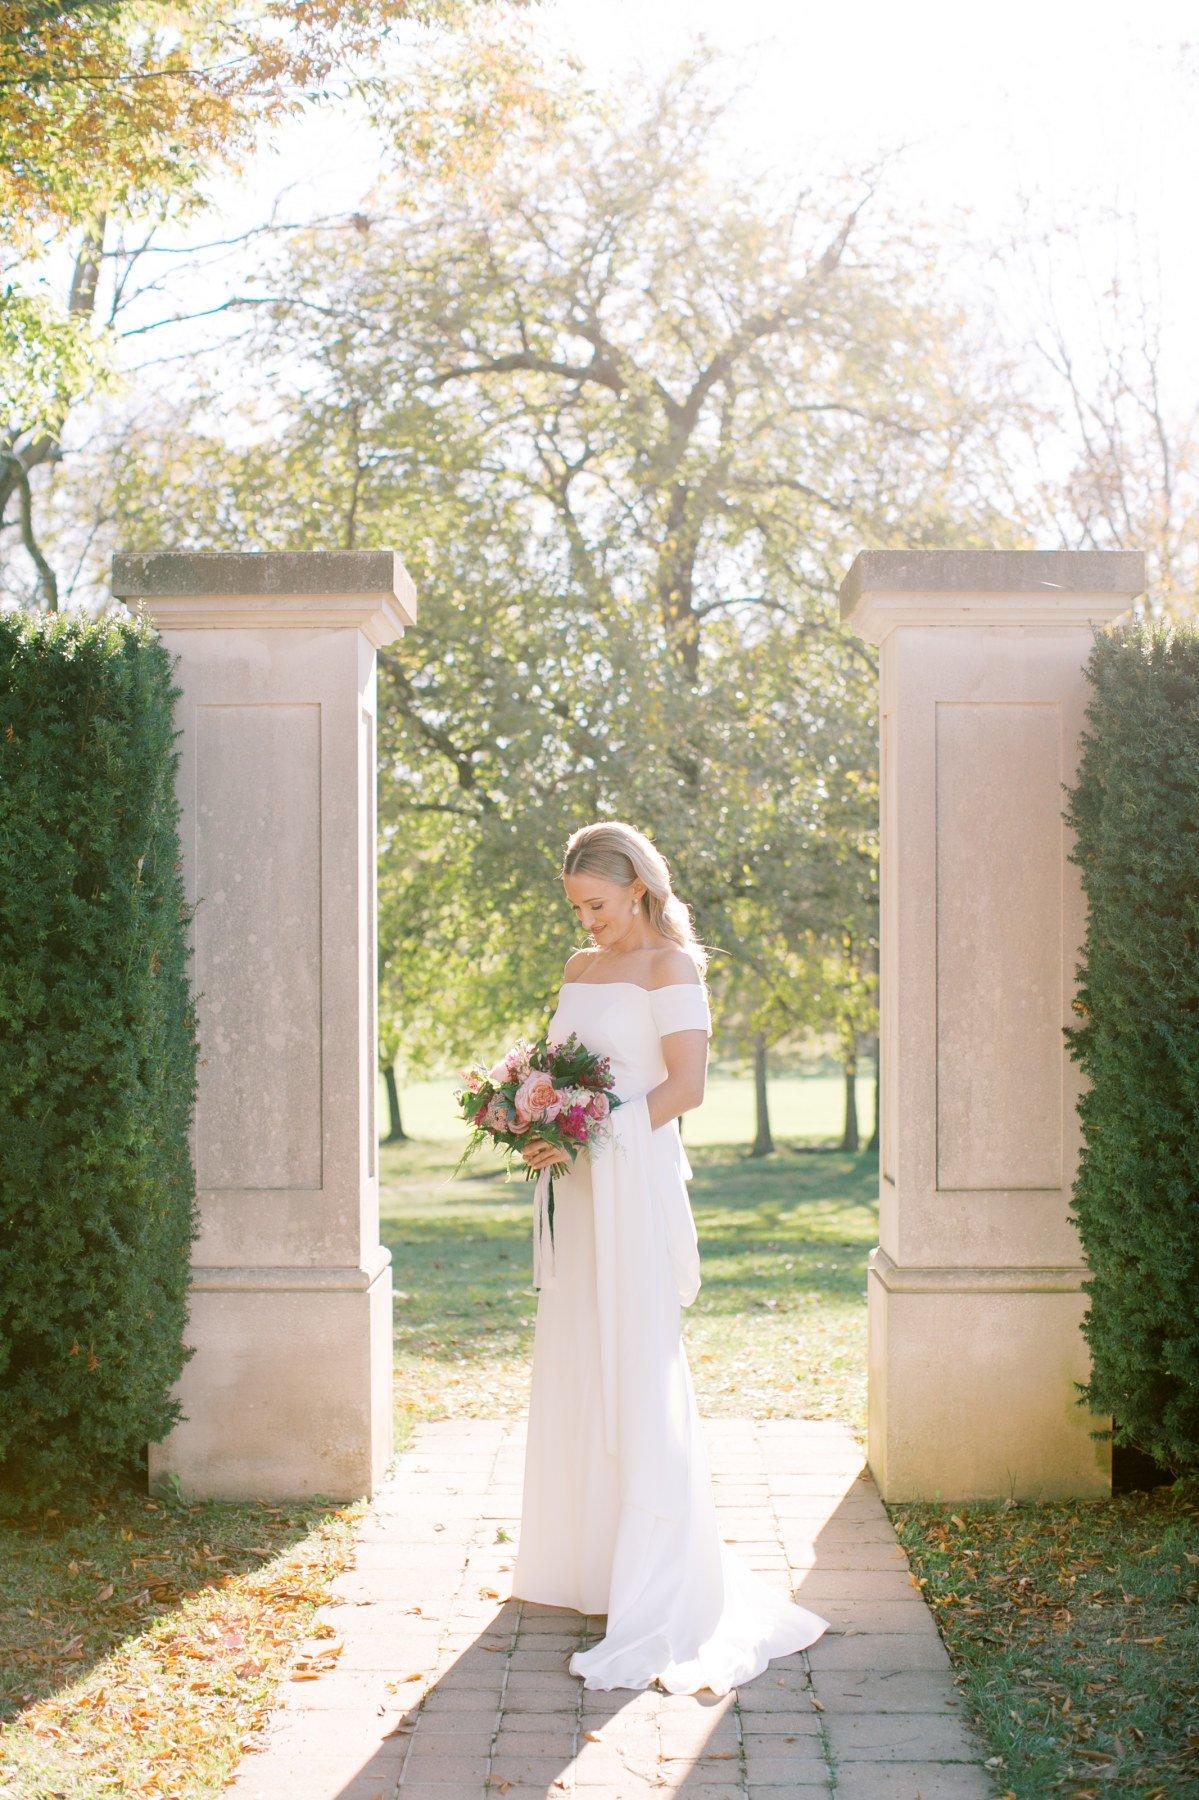 57Great_Marsh_Estate_Jillian_Justin_Wedding_AstridPhotography_AnneKelleyEventsAP_01769